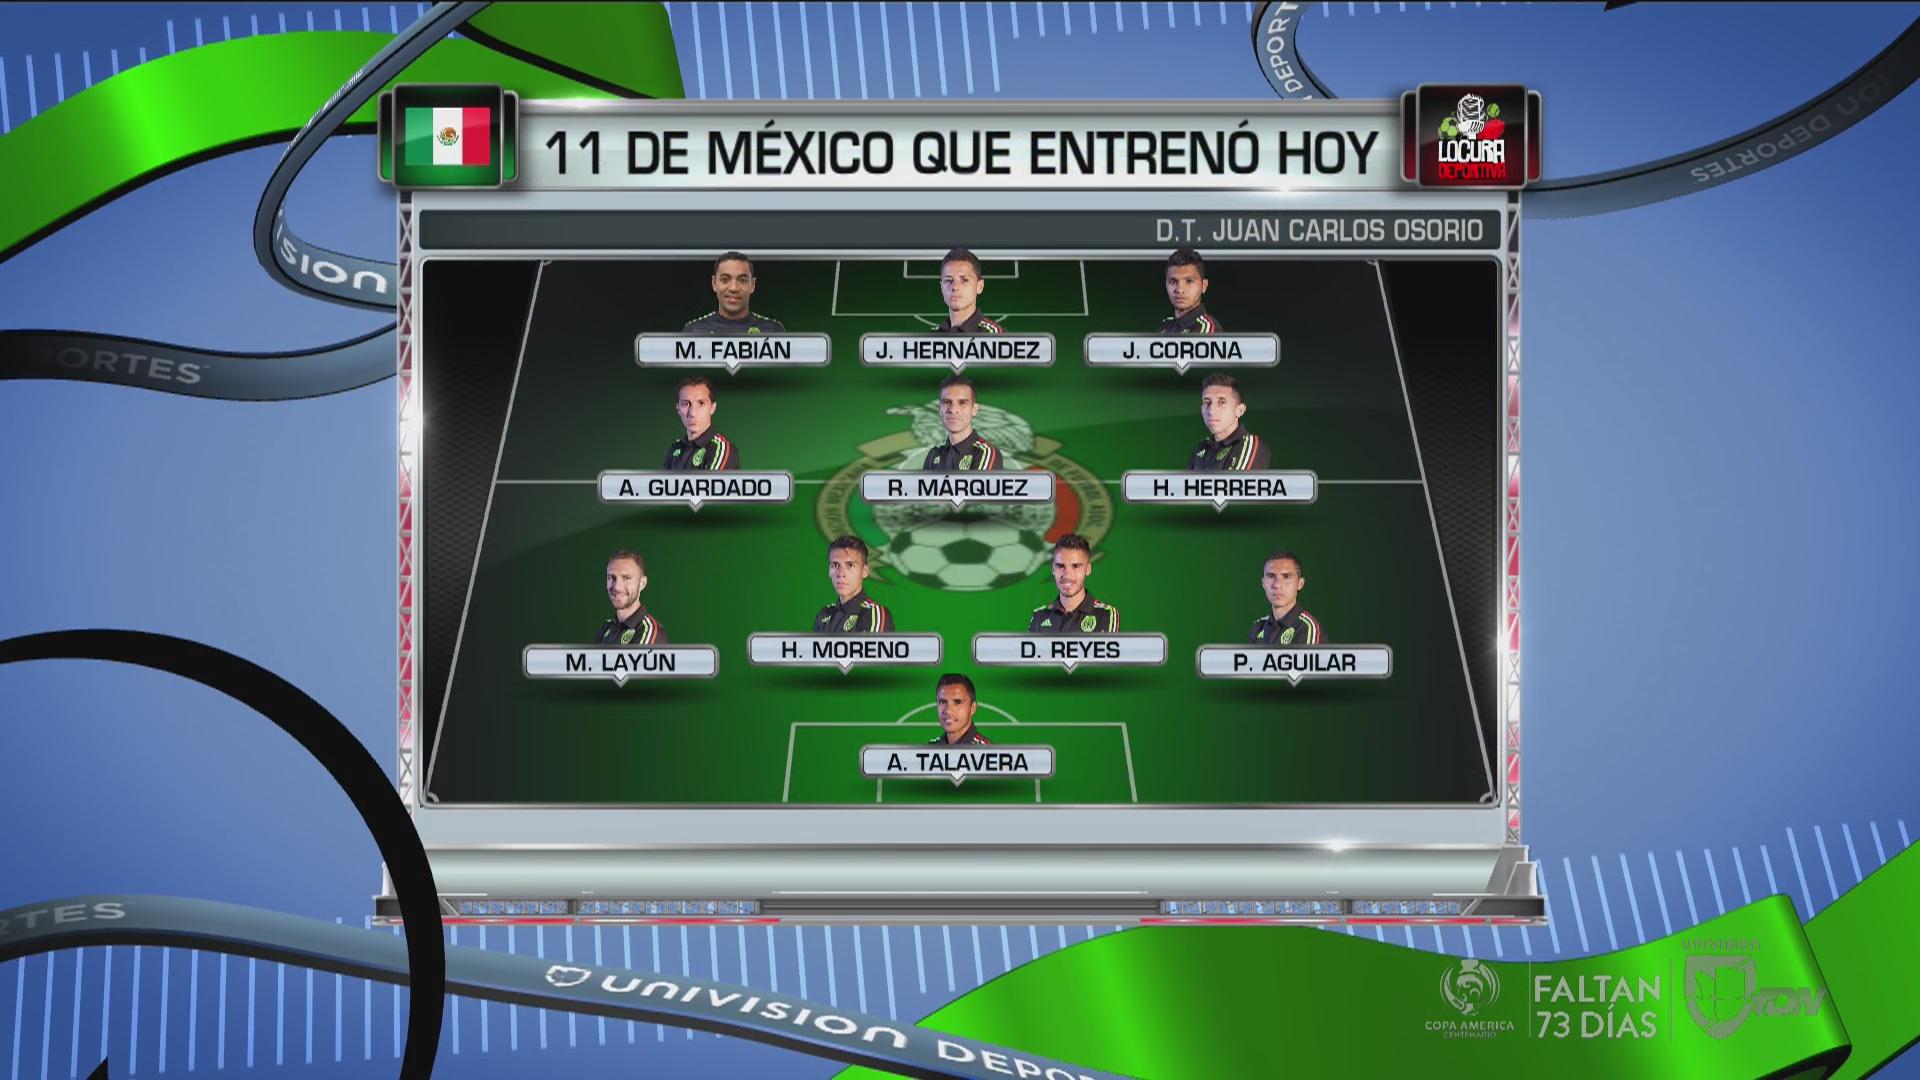 ... ensayó la posible alineación de México ante Canadá - Univision